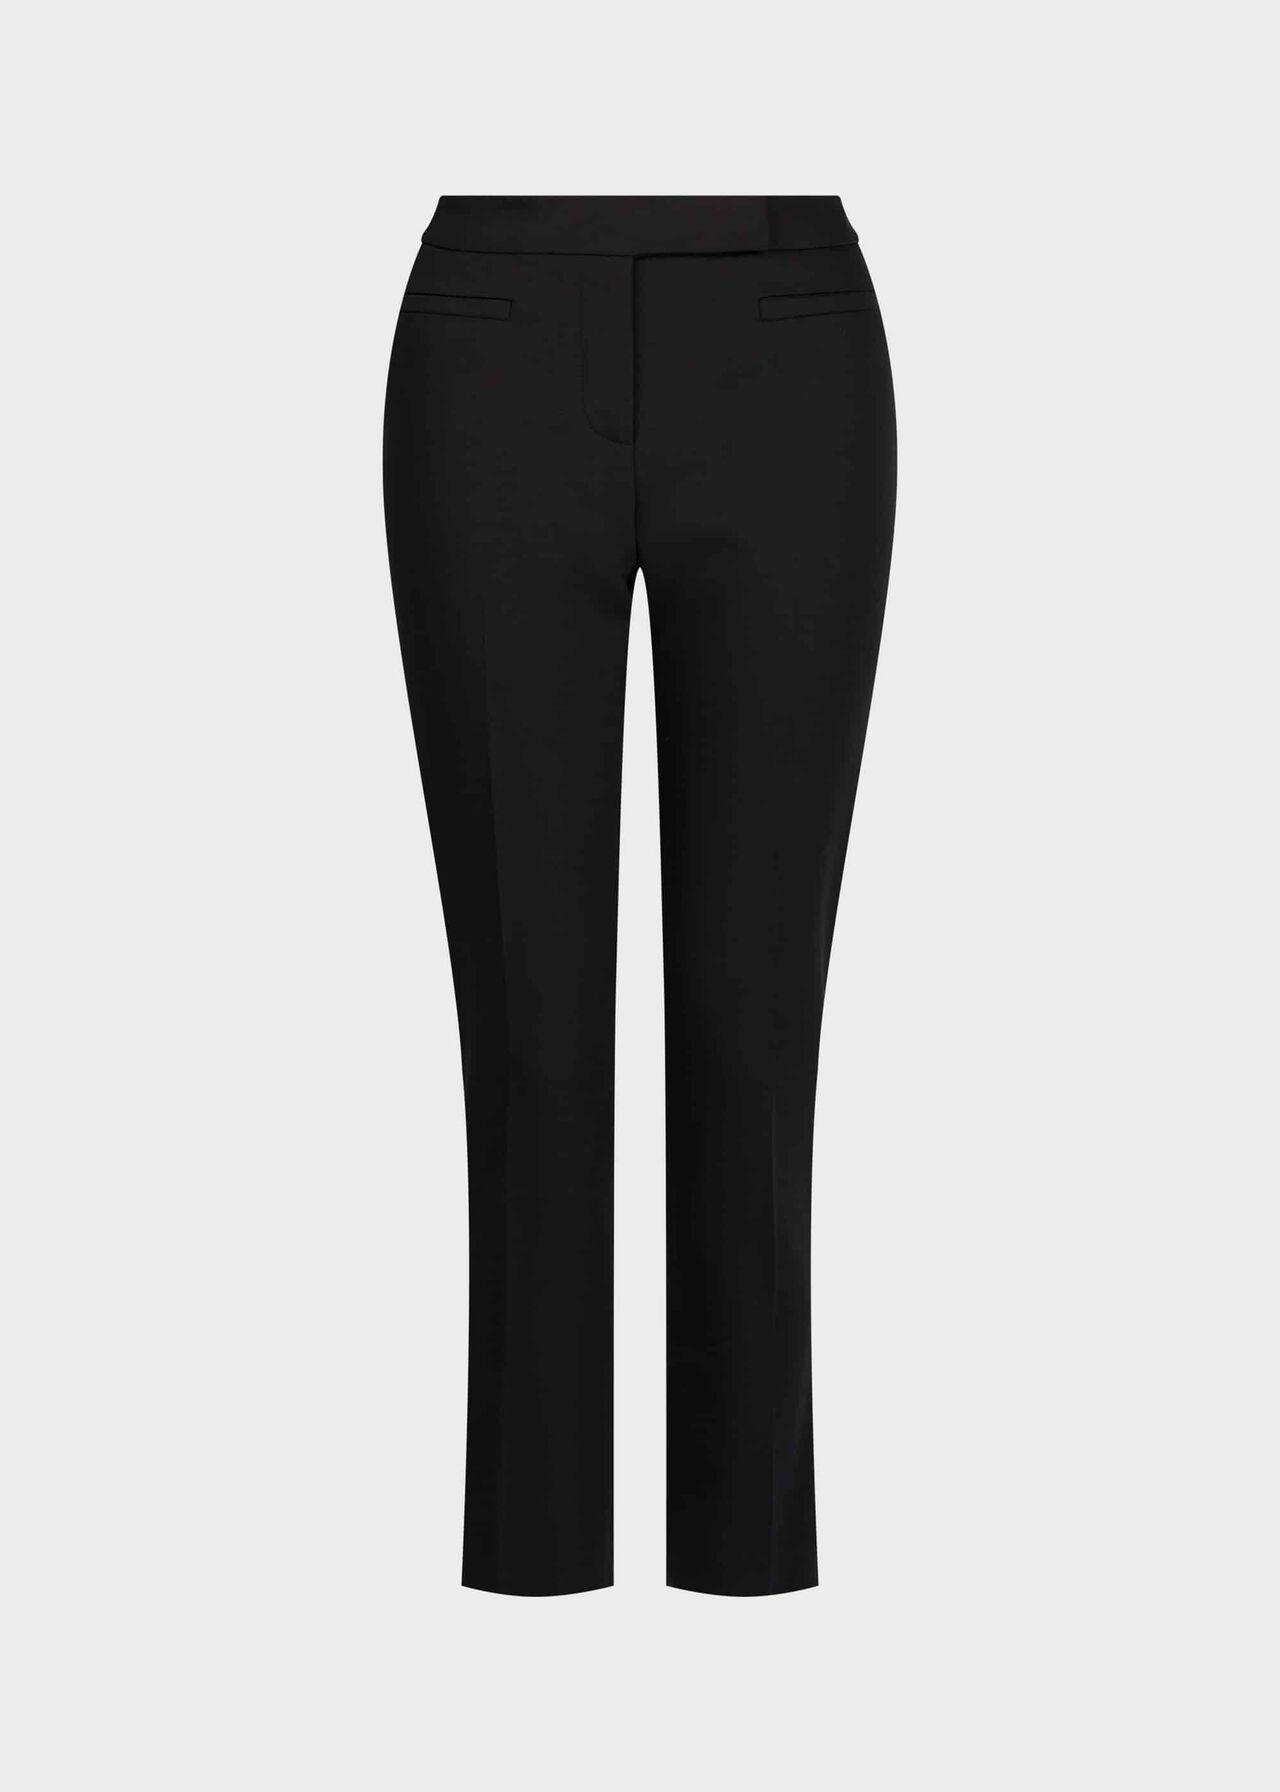 Petite Annie Slim trousers Black